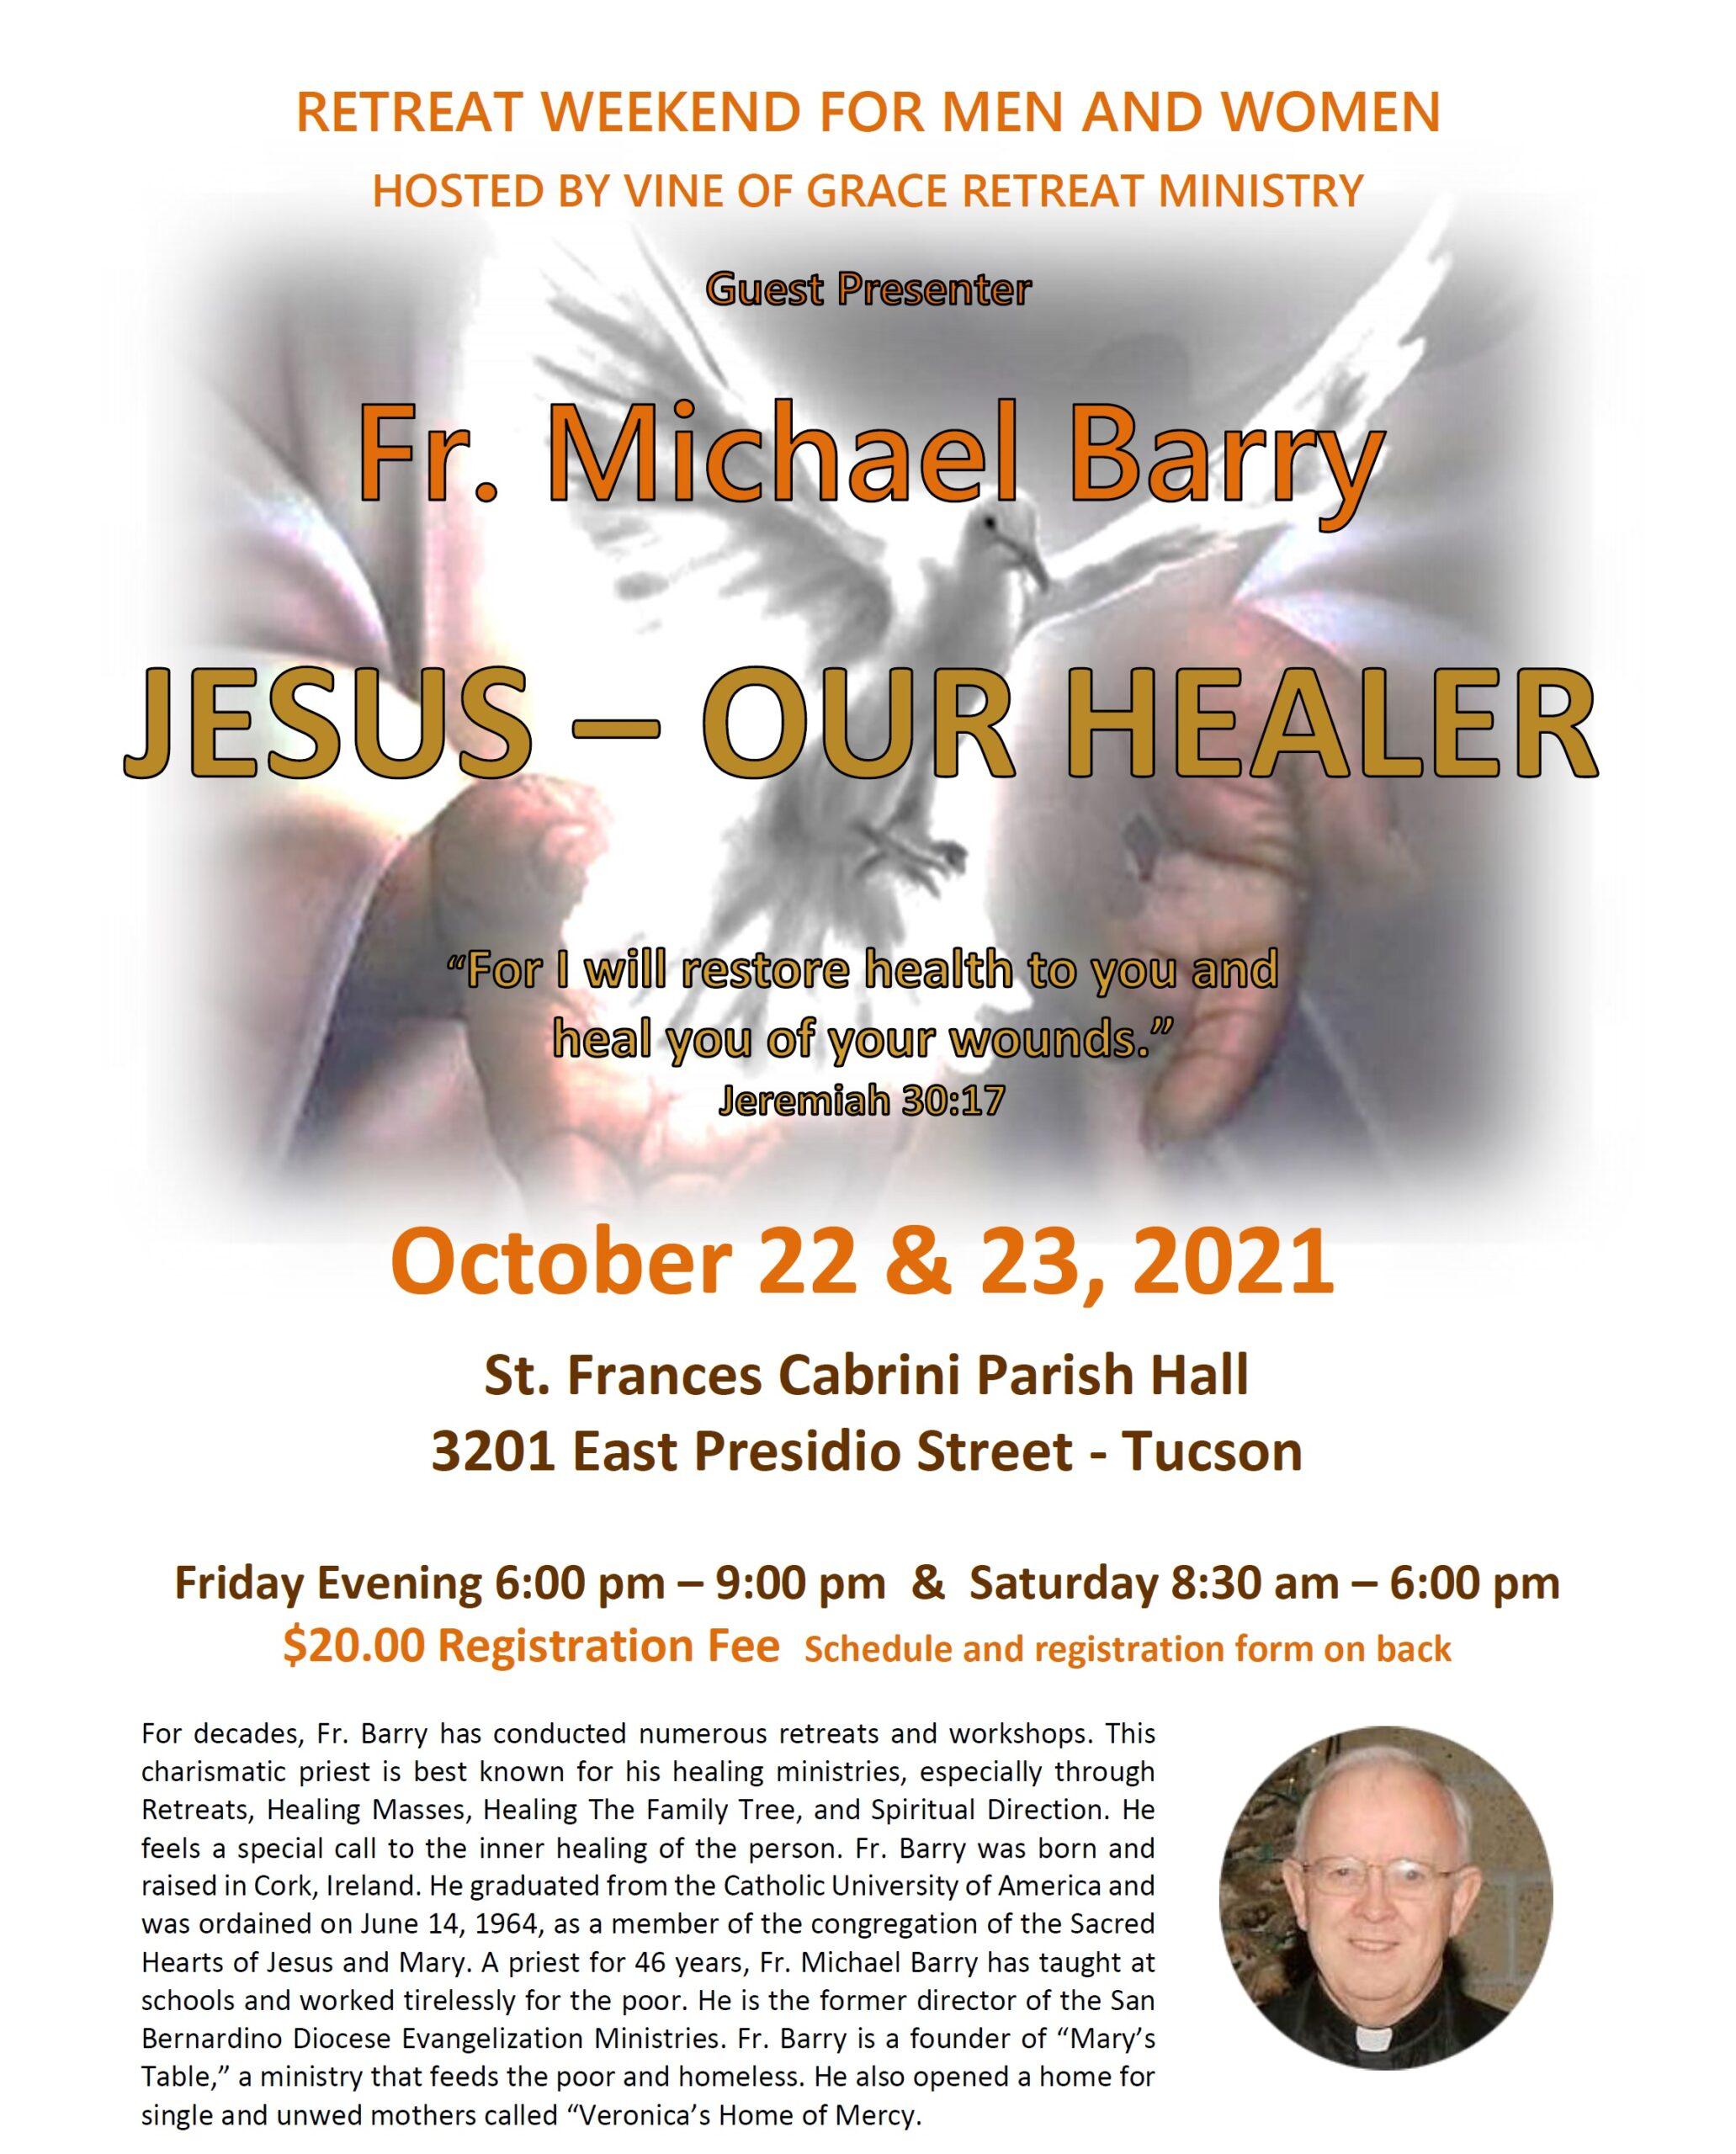 Jesus Our Healer retreat 2021-10-22